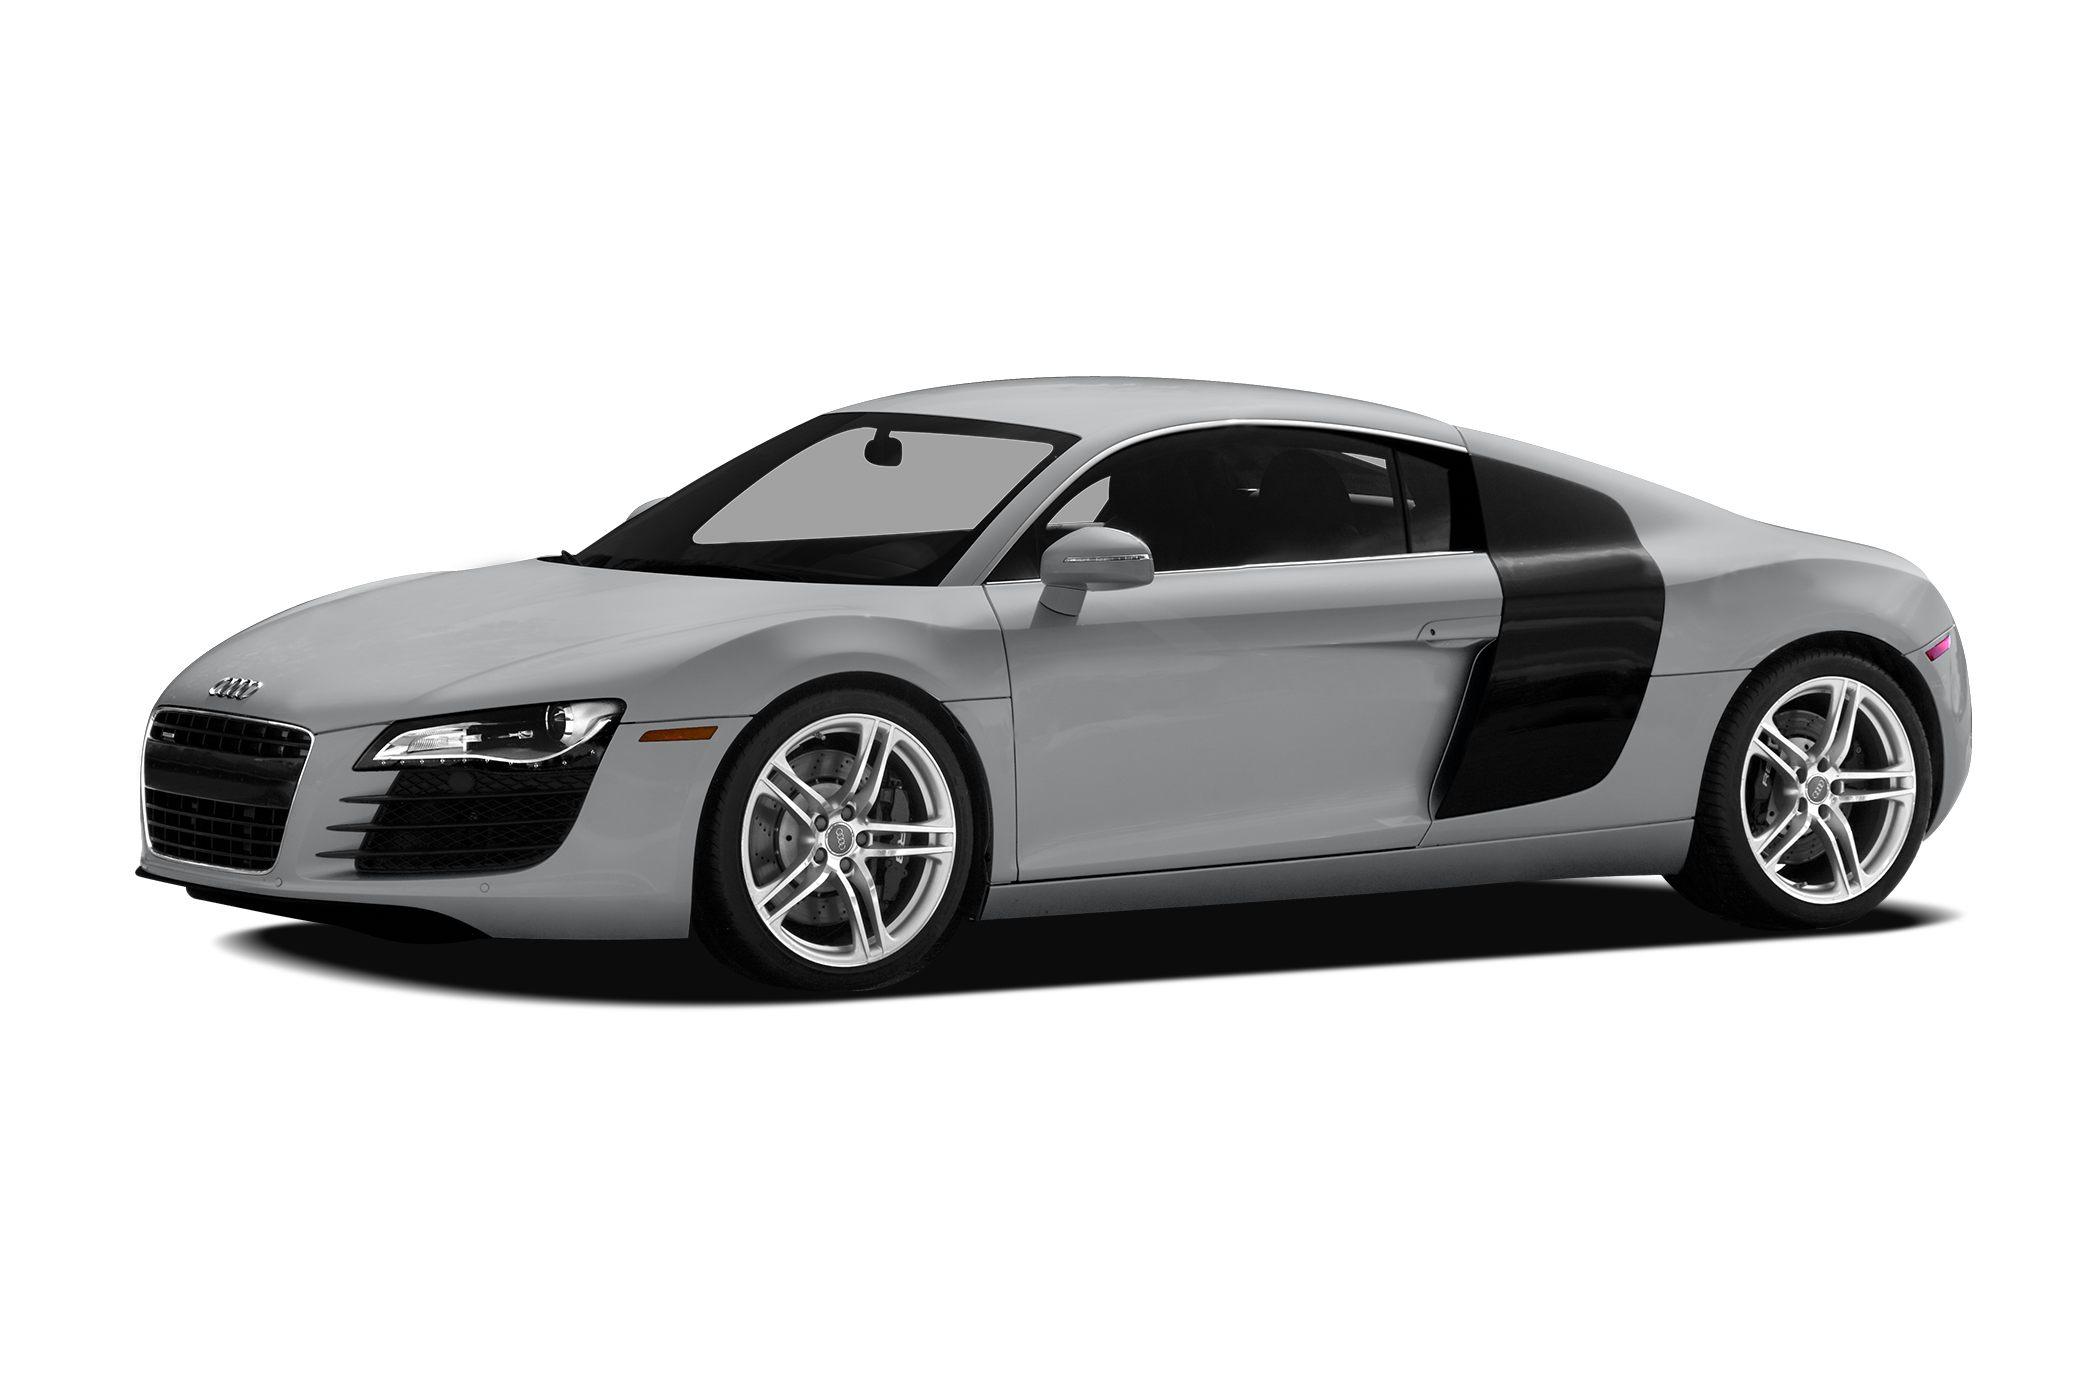 Portland Car Dealerships >> 2008 BMW M6 Reviews - Autoblog and New Car Test Drive